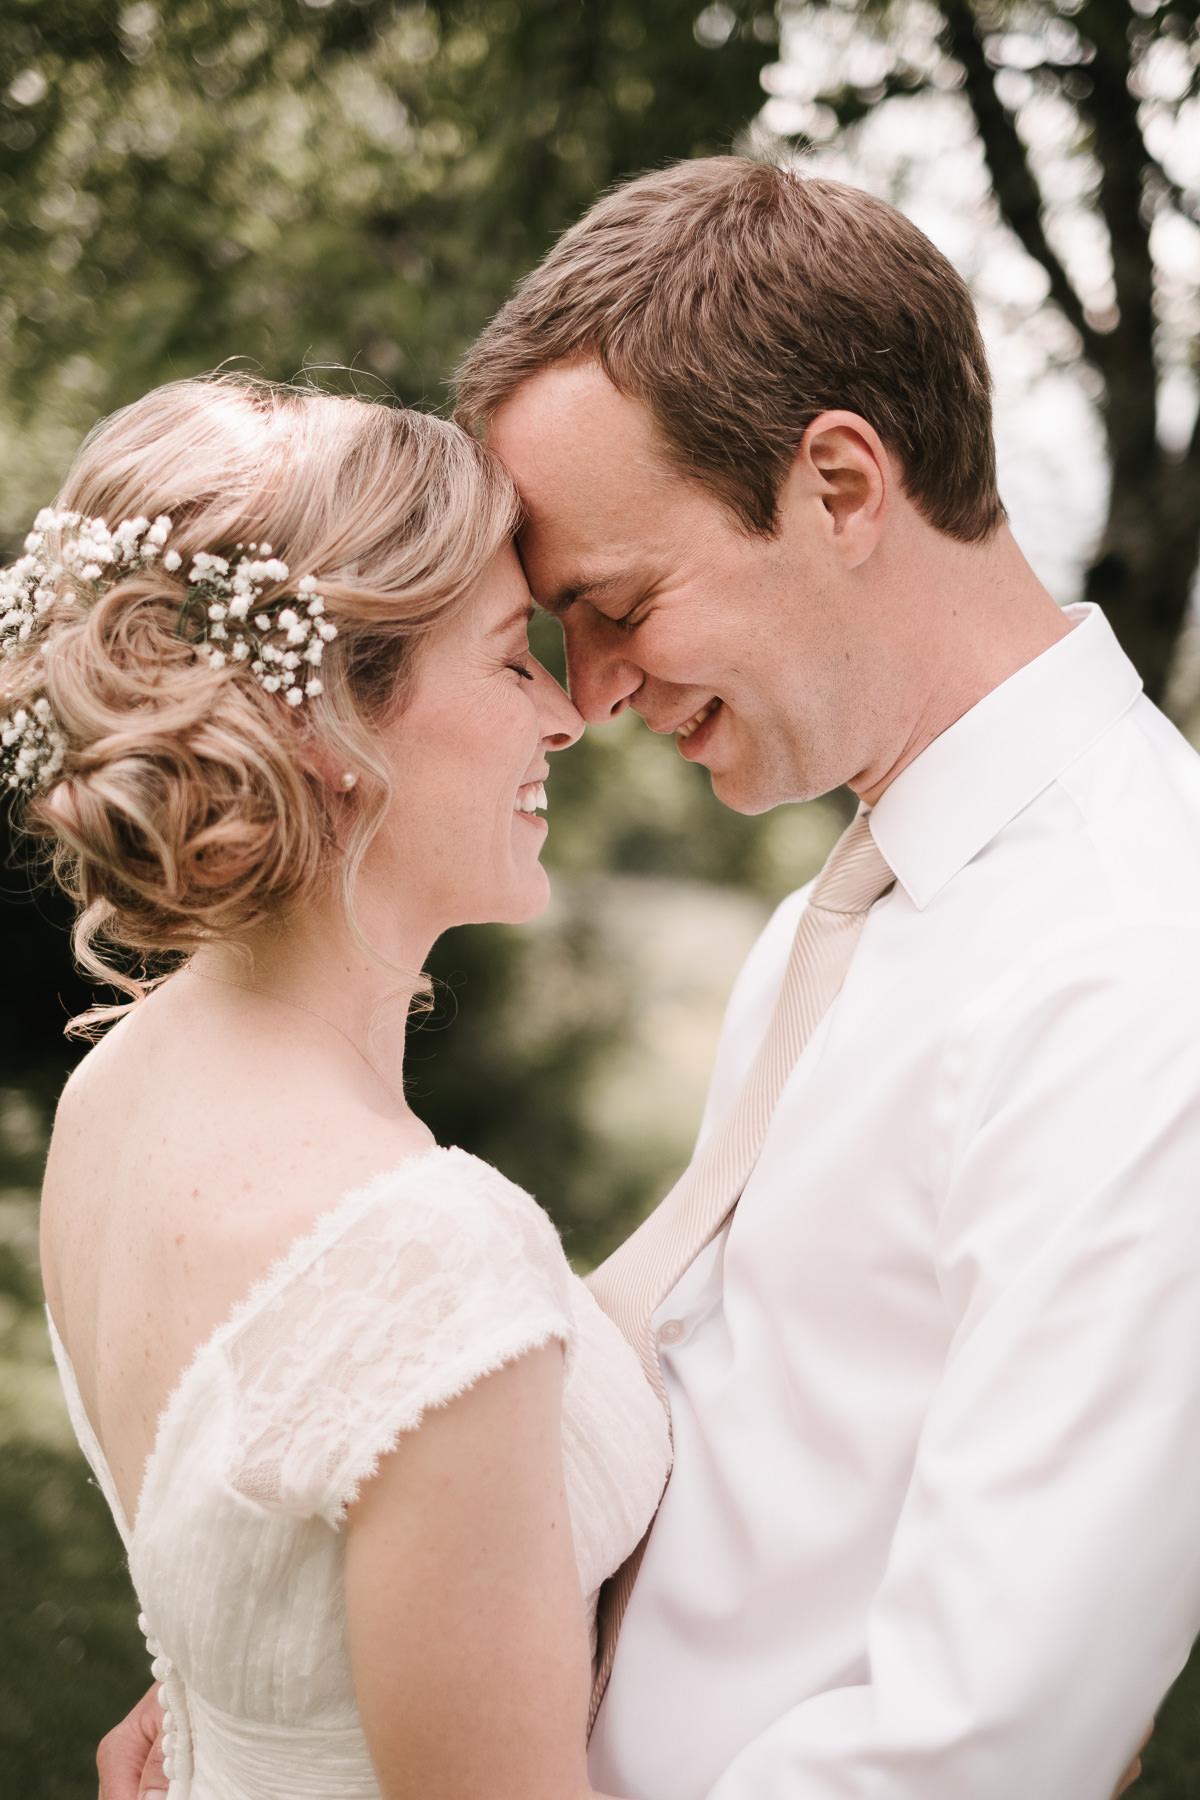 Mariage à La Grange à Jules, Annecy